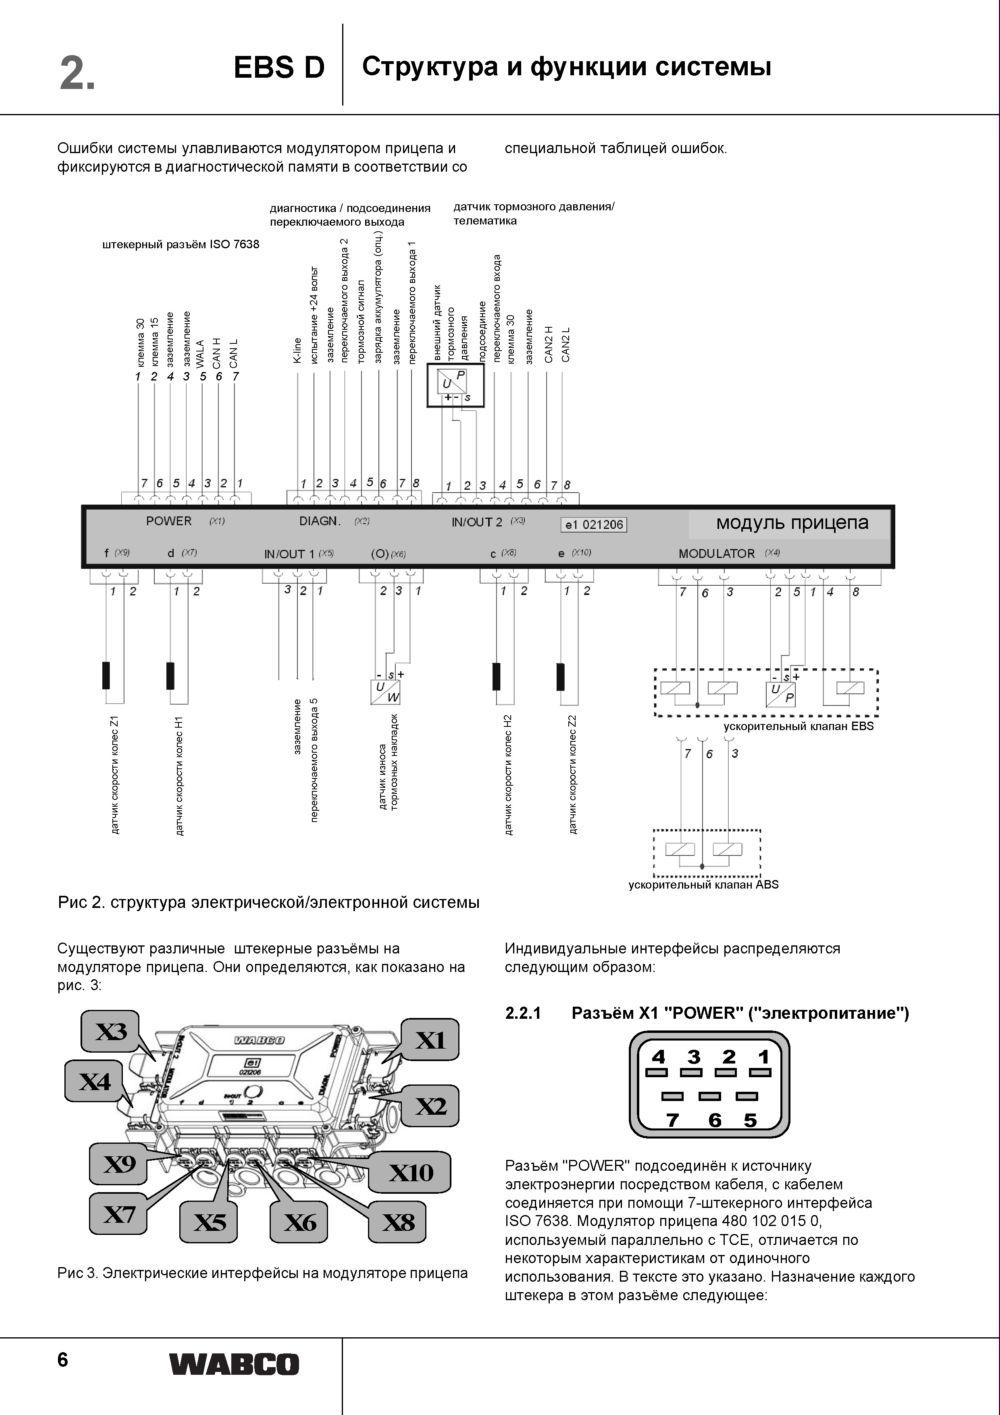 438Тормозная система wabco abs схема